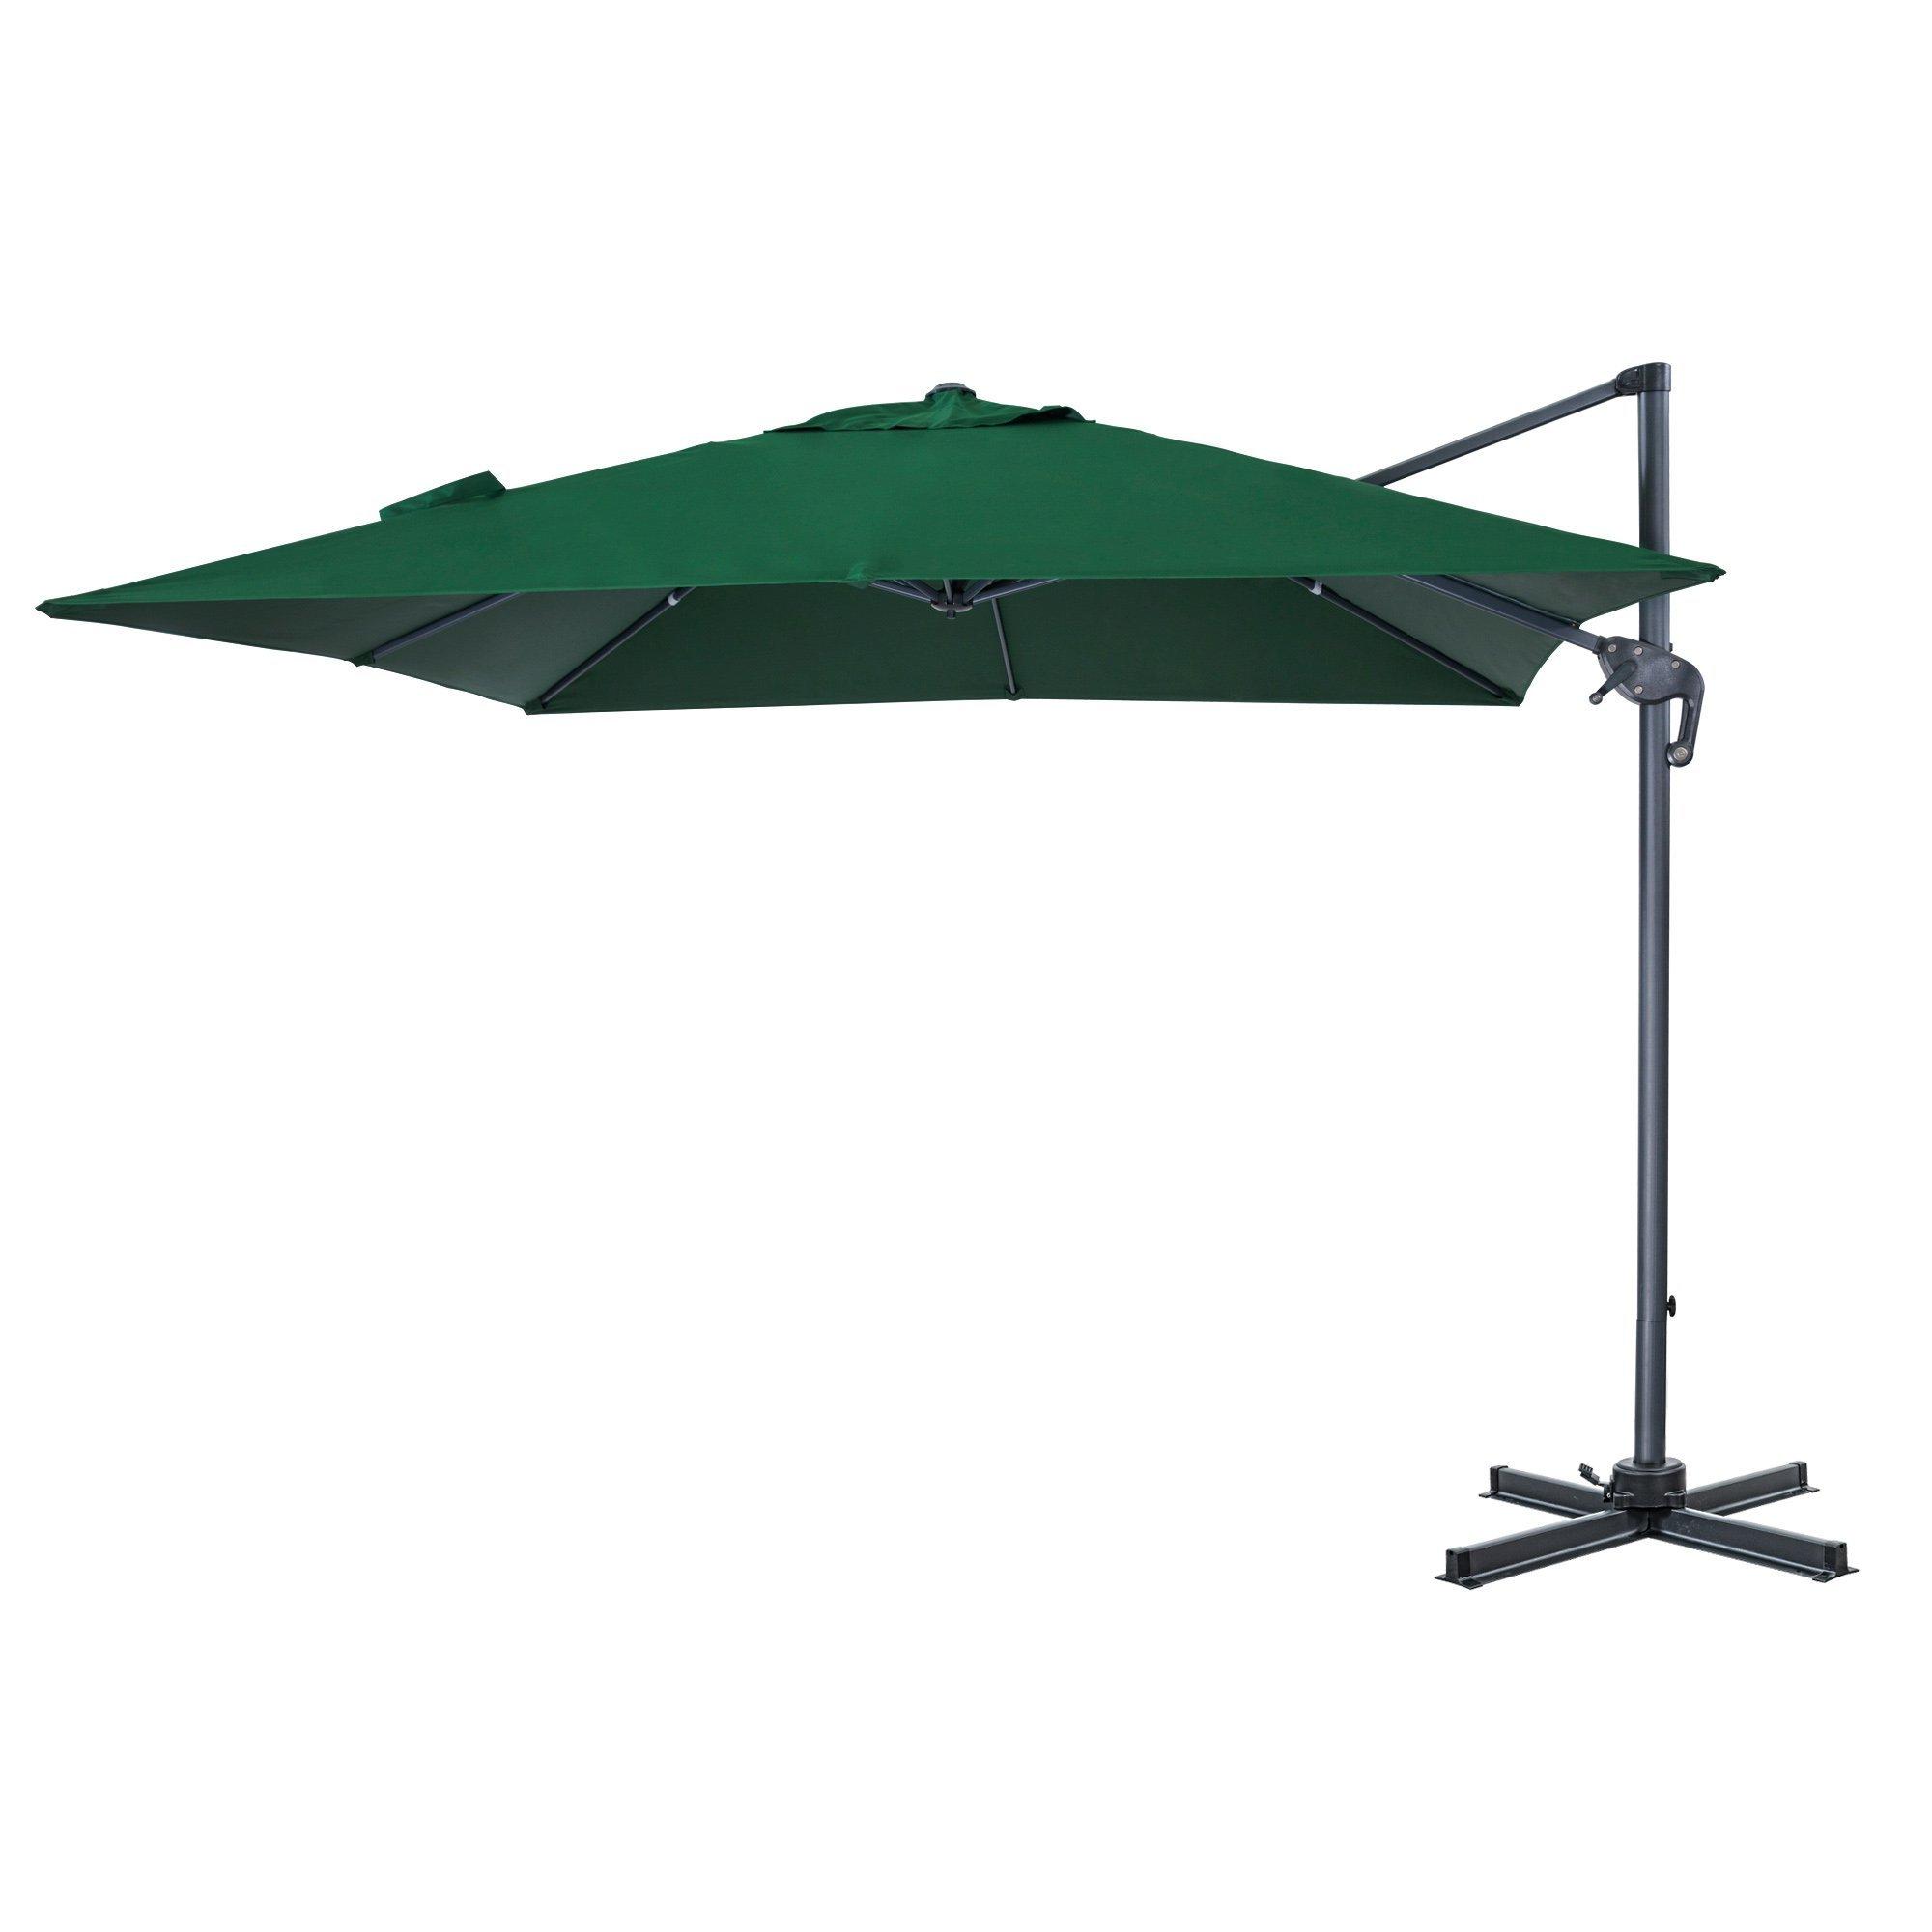 Yajaira Cantilever Umbrellas In Preferred Elmhur Patio Offset 10' Cantilever Umbrella (View 18 of 20)